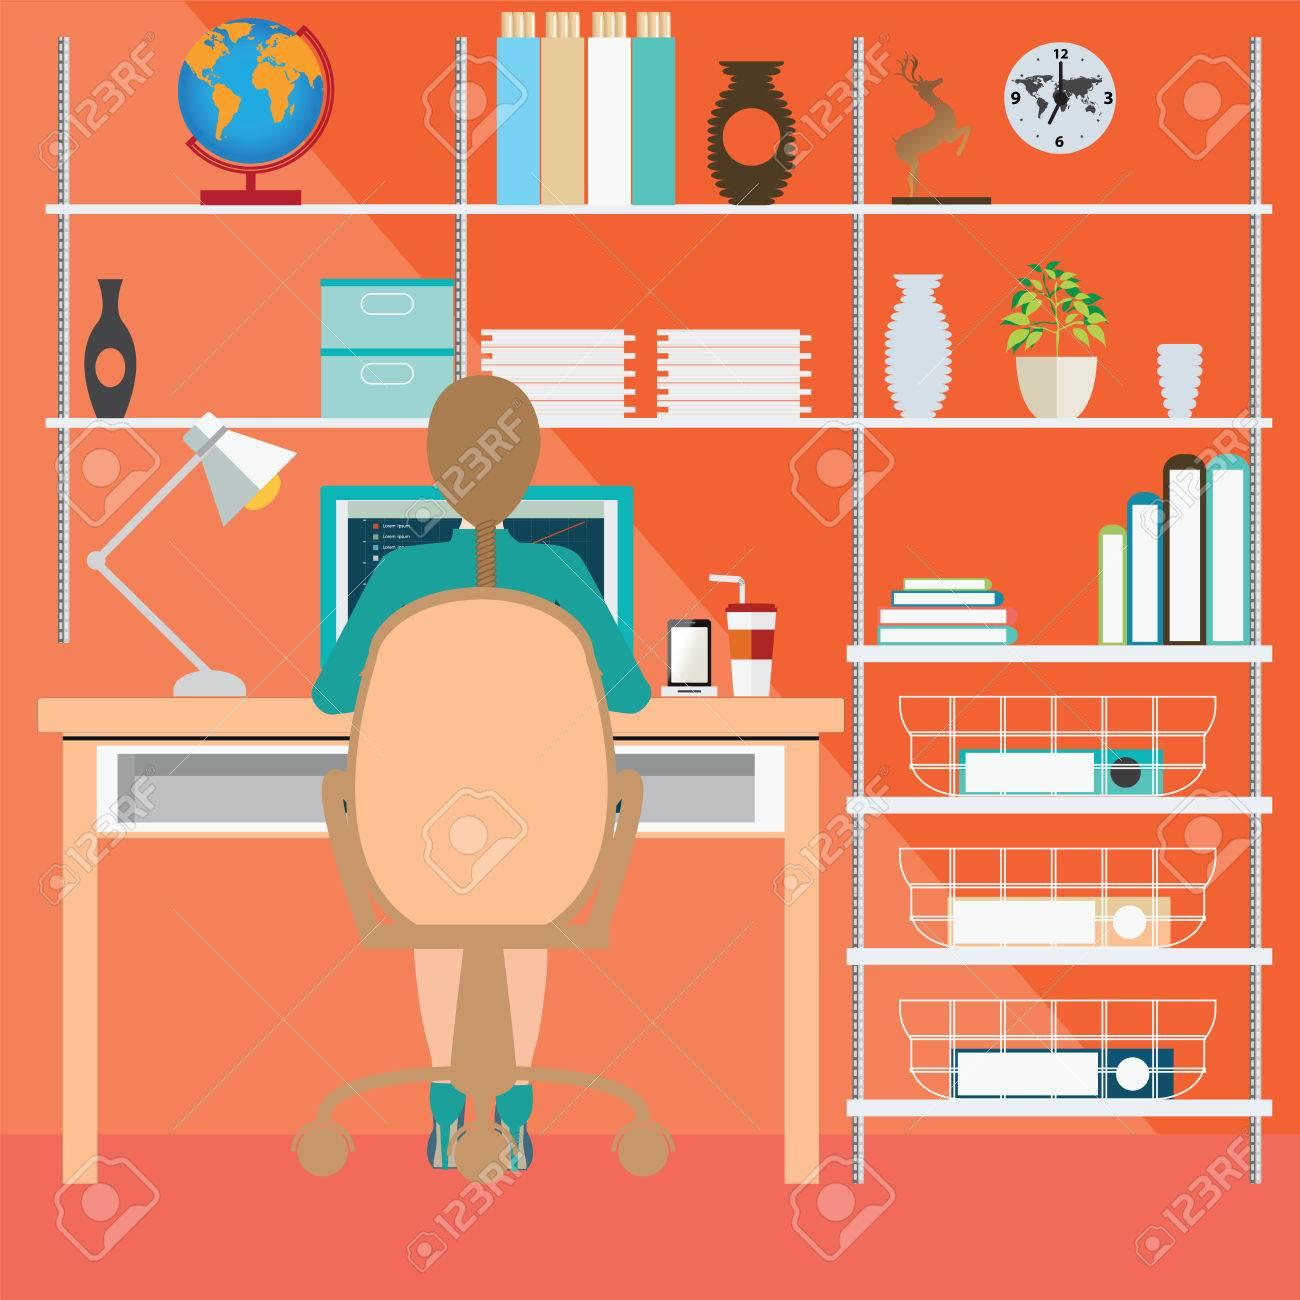 Business-Frau Arbeitet Im Büro Zu Hause, Büroleute, Büro Inter ...